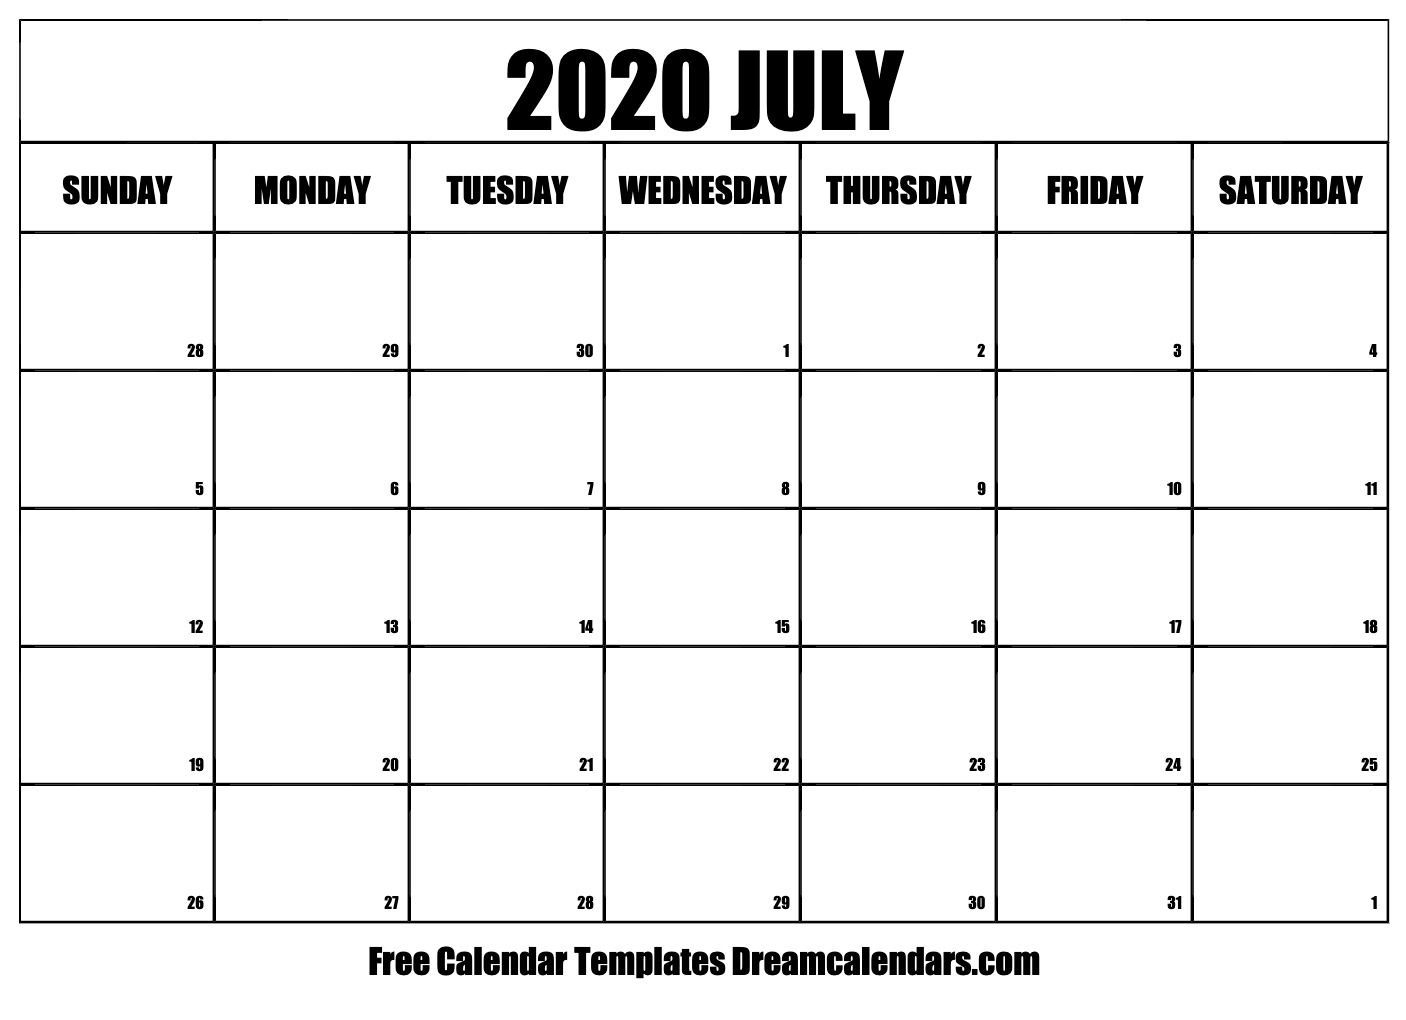 July 2020 Calendar Template Word, Pdf, Excel Format